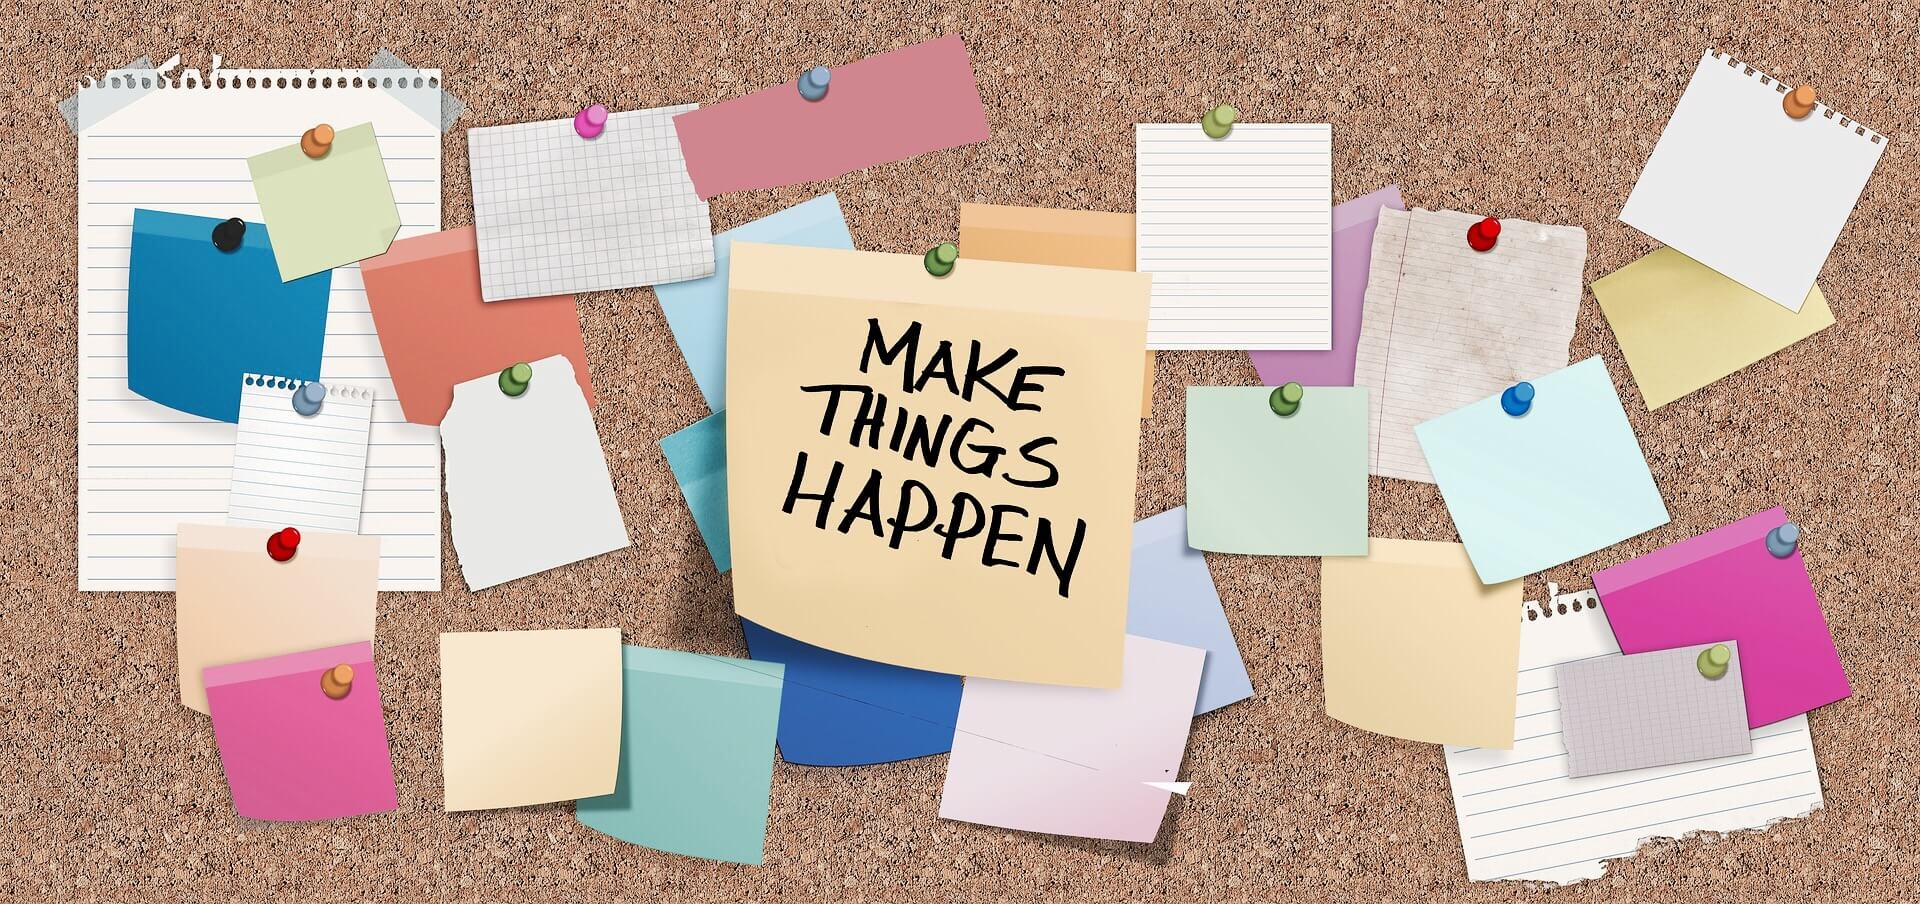 Pinnwand mit einem Post-It Make Things Happen